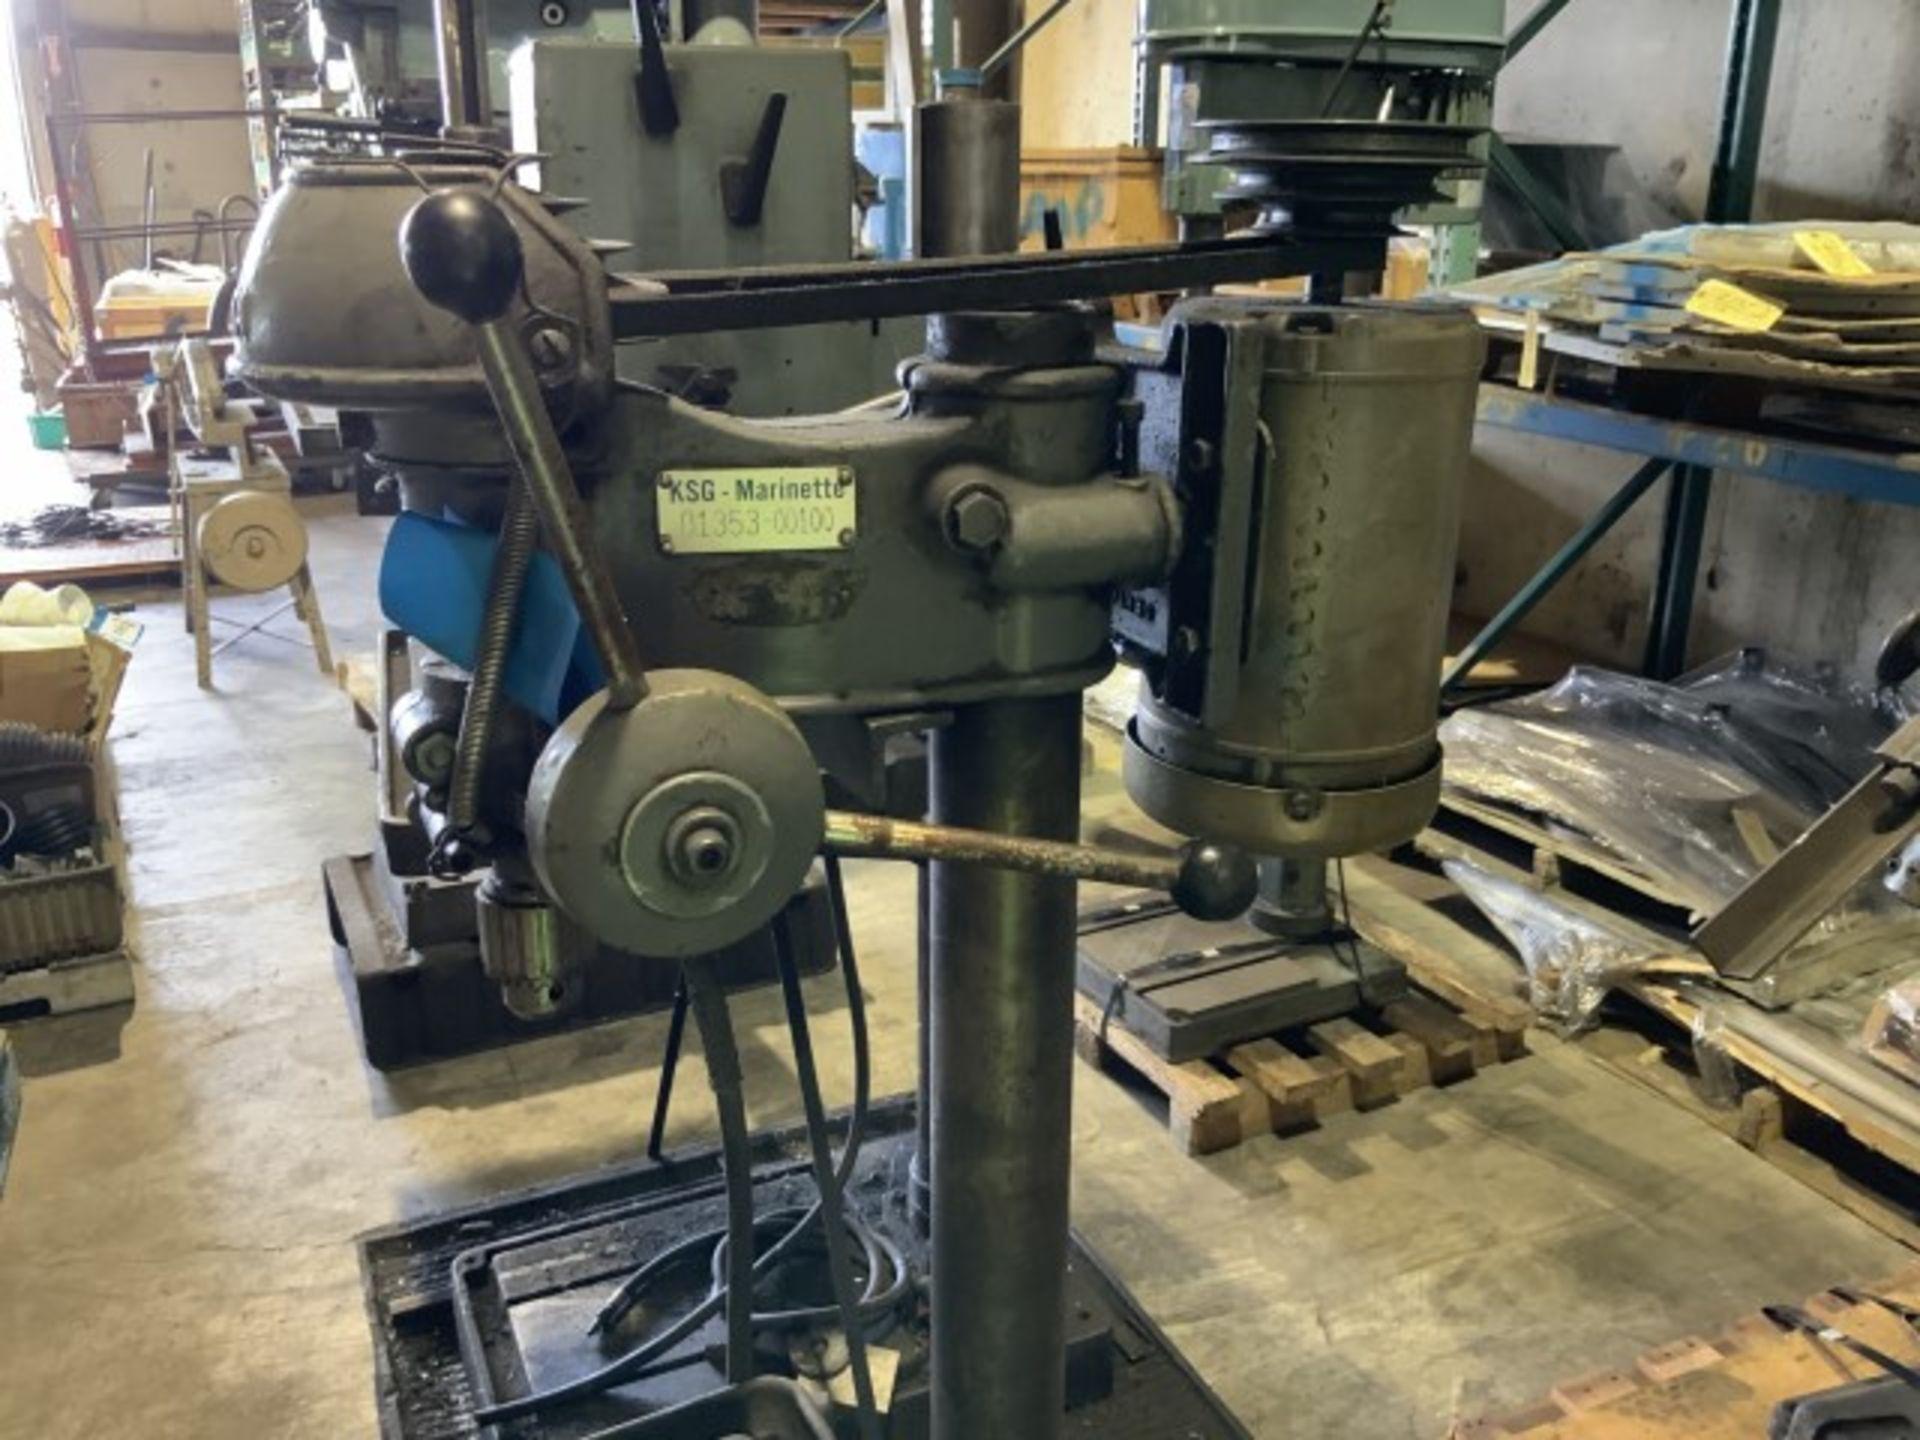 Drill press - Image 4 of 4